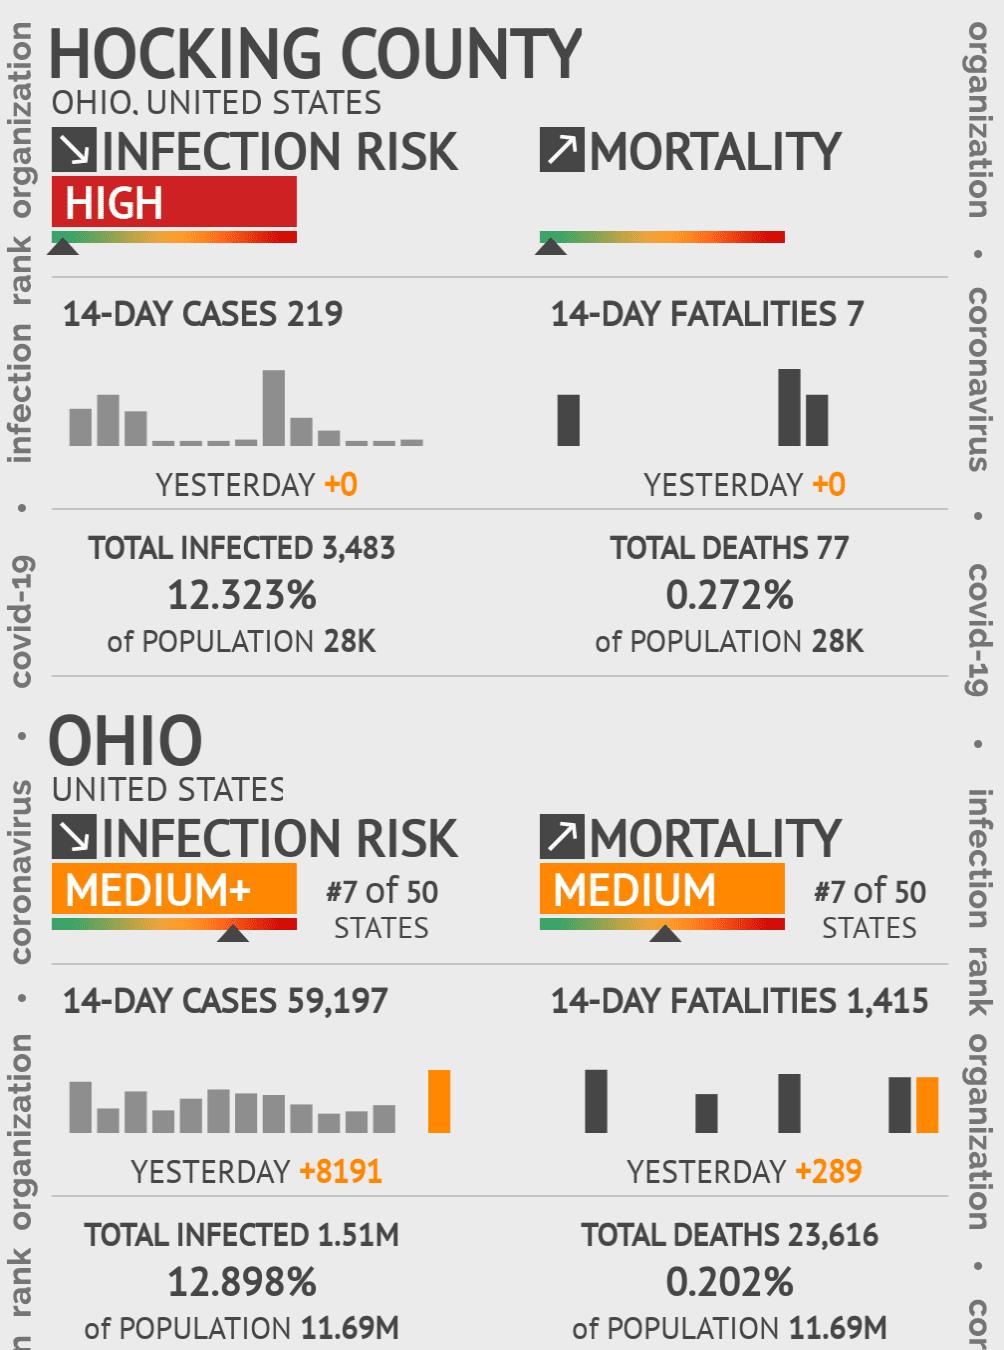 Hocking County Coronavirus Covid-19 Risk of Infection on November 26, 2020